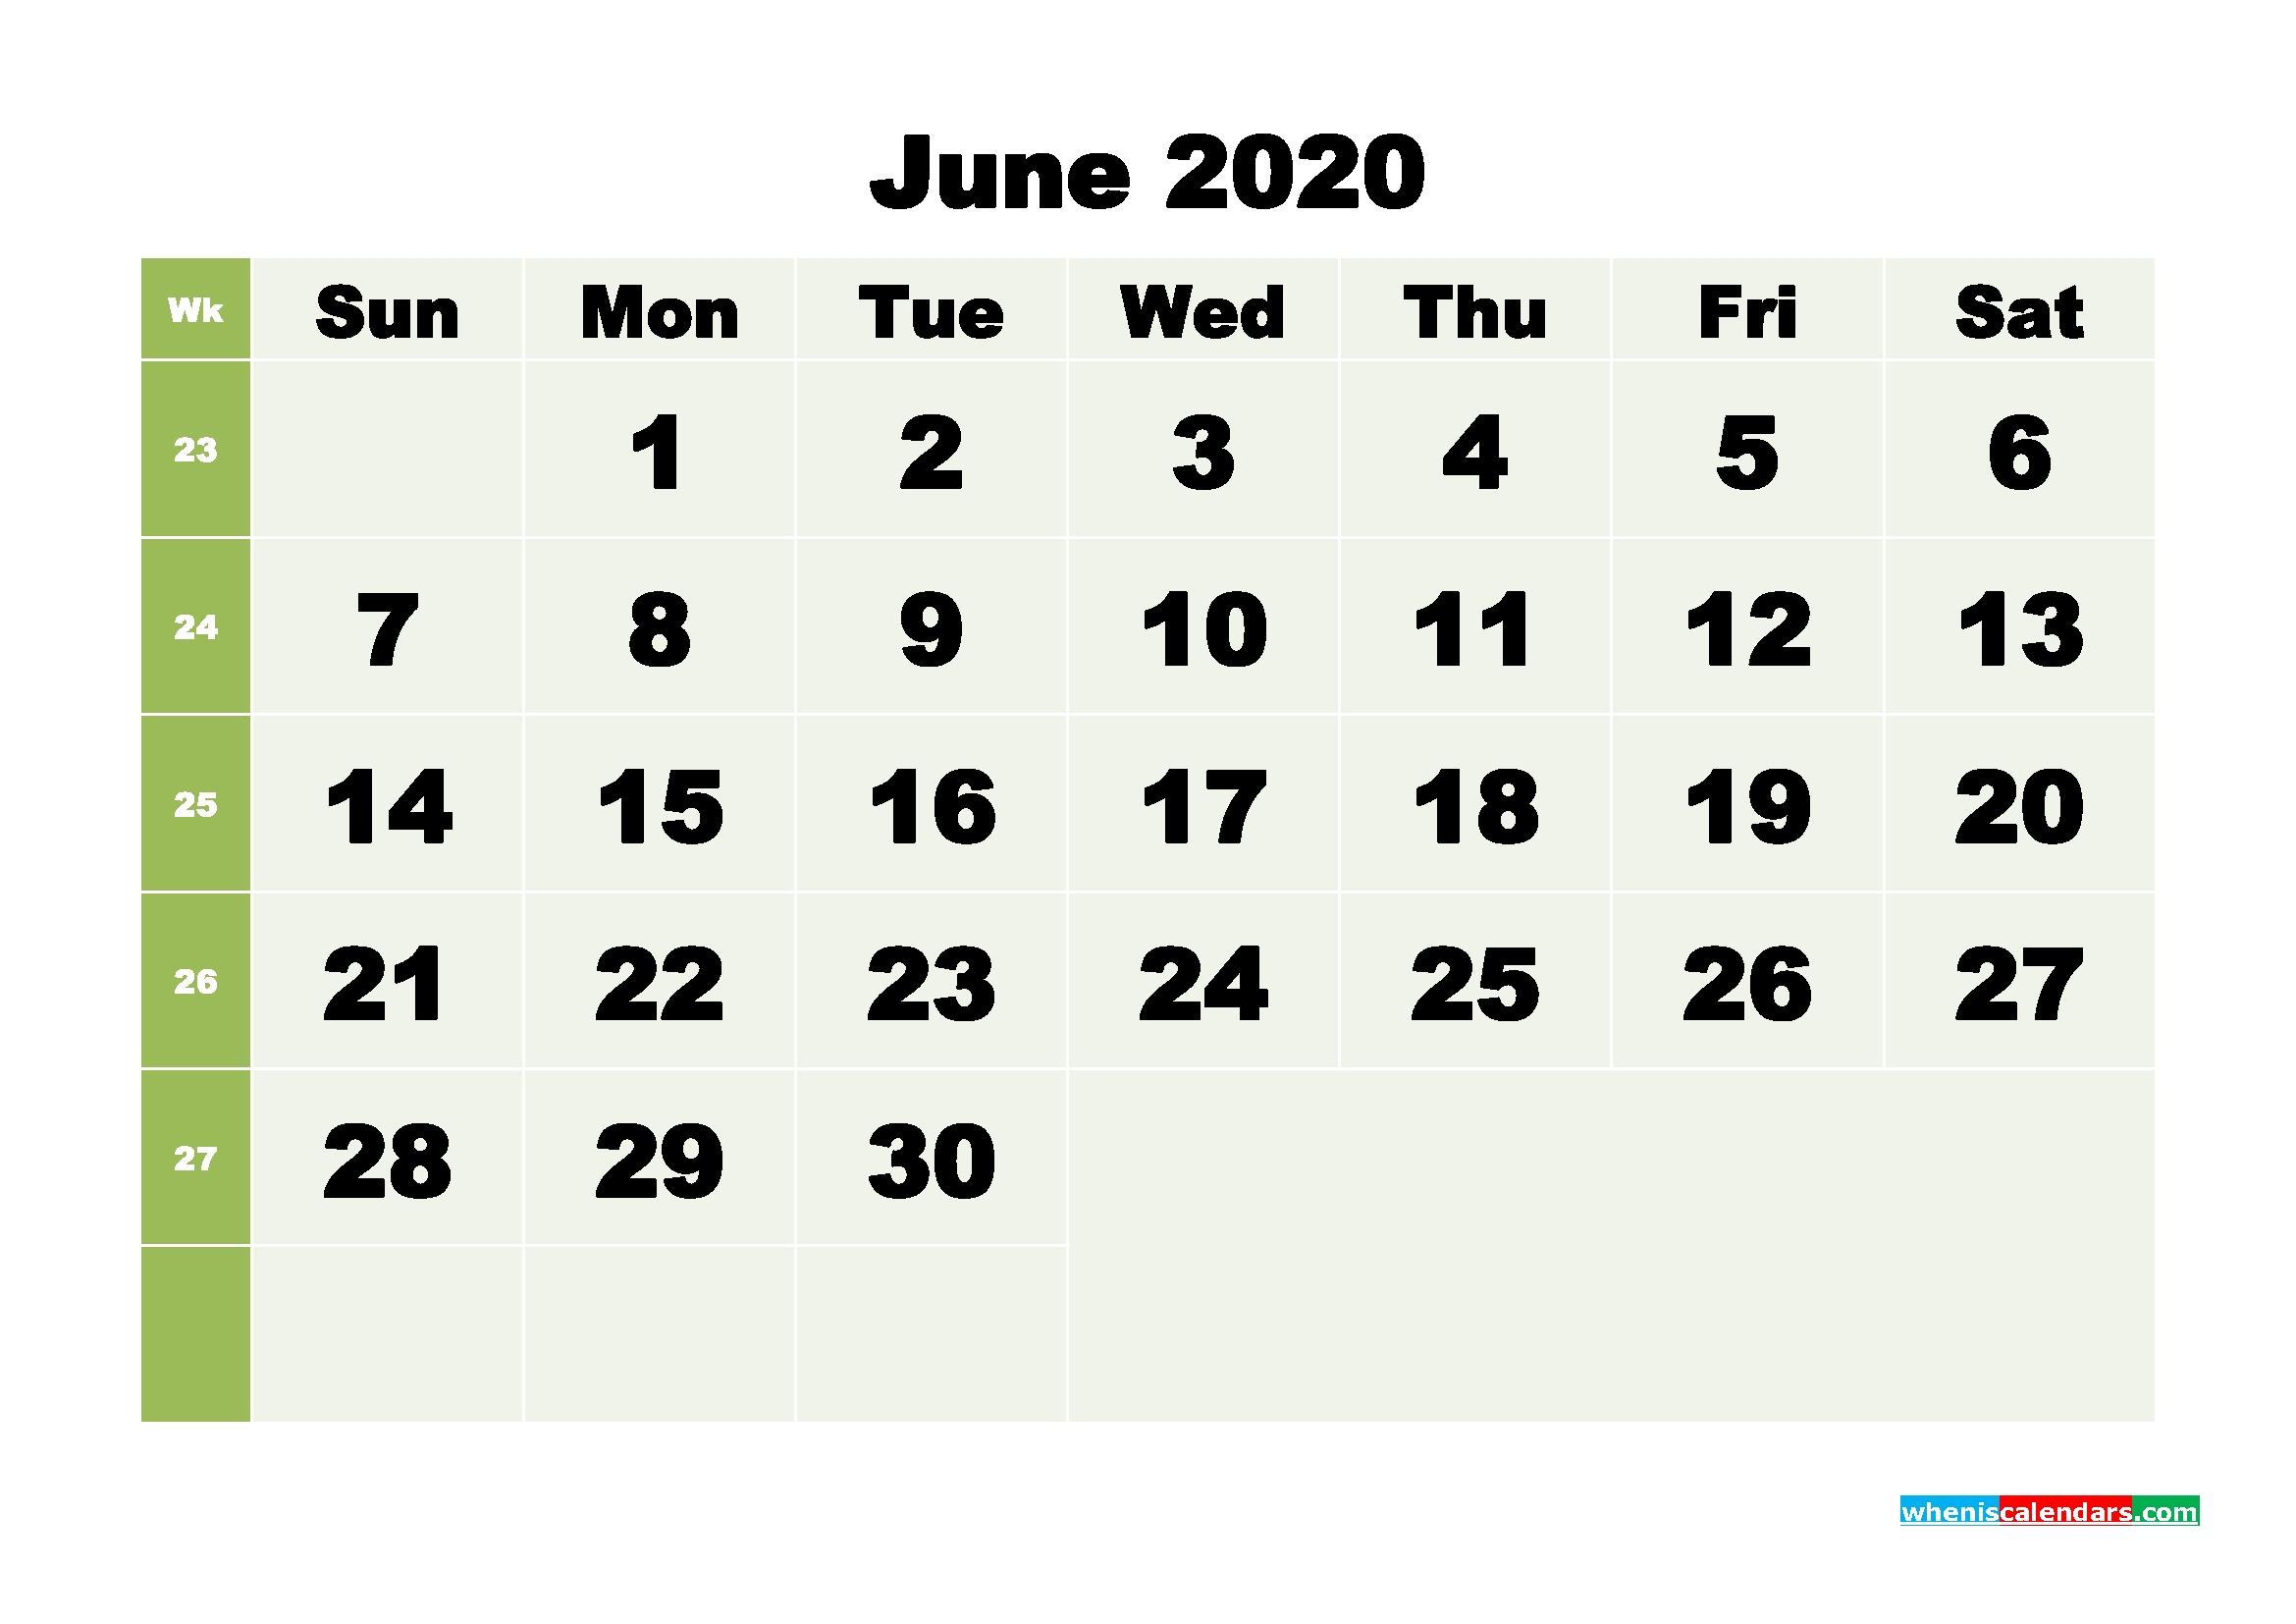 Free Blank Calendar June 2020 Printable - No.m20B258 | Free-Blank 3 Month Calendar 2020 Printable